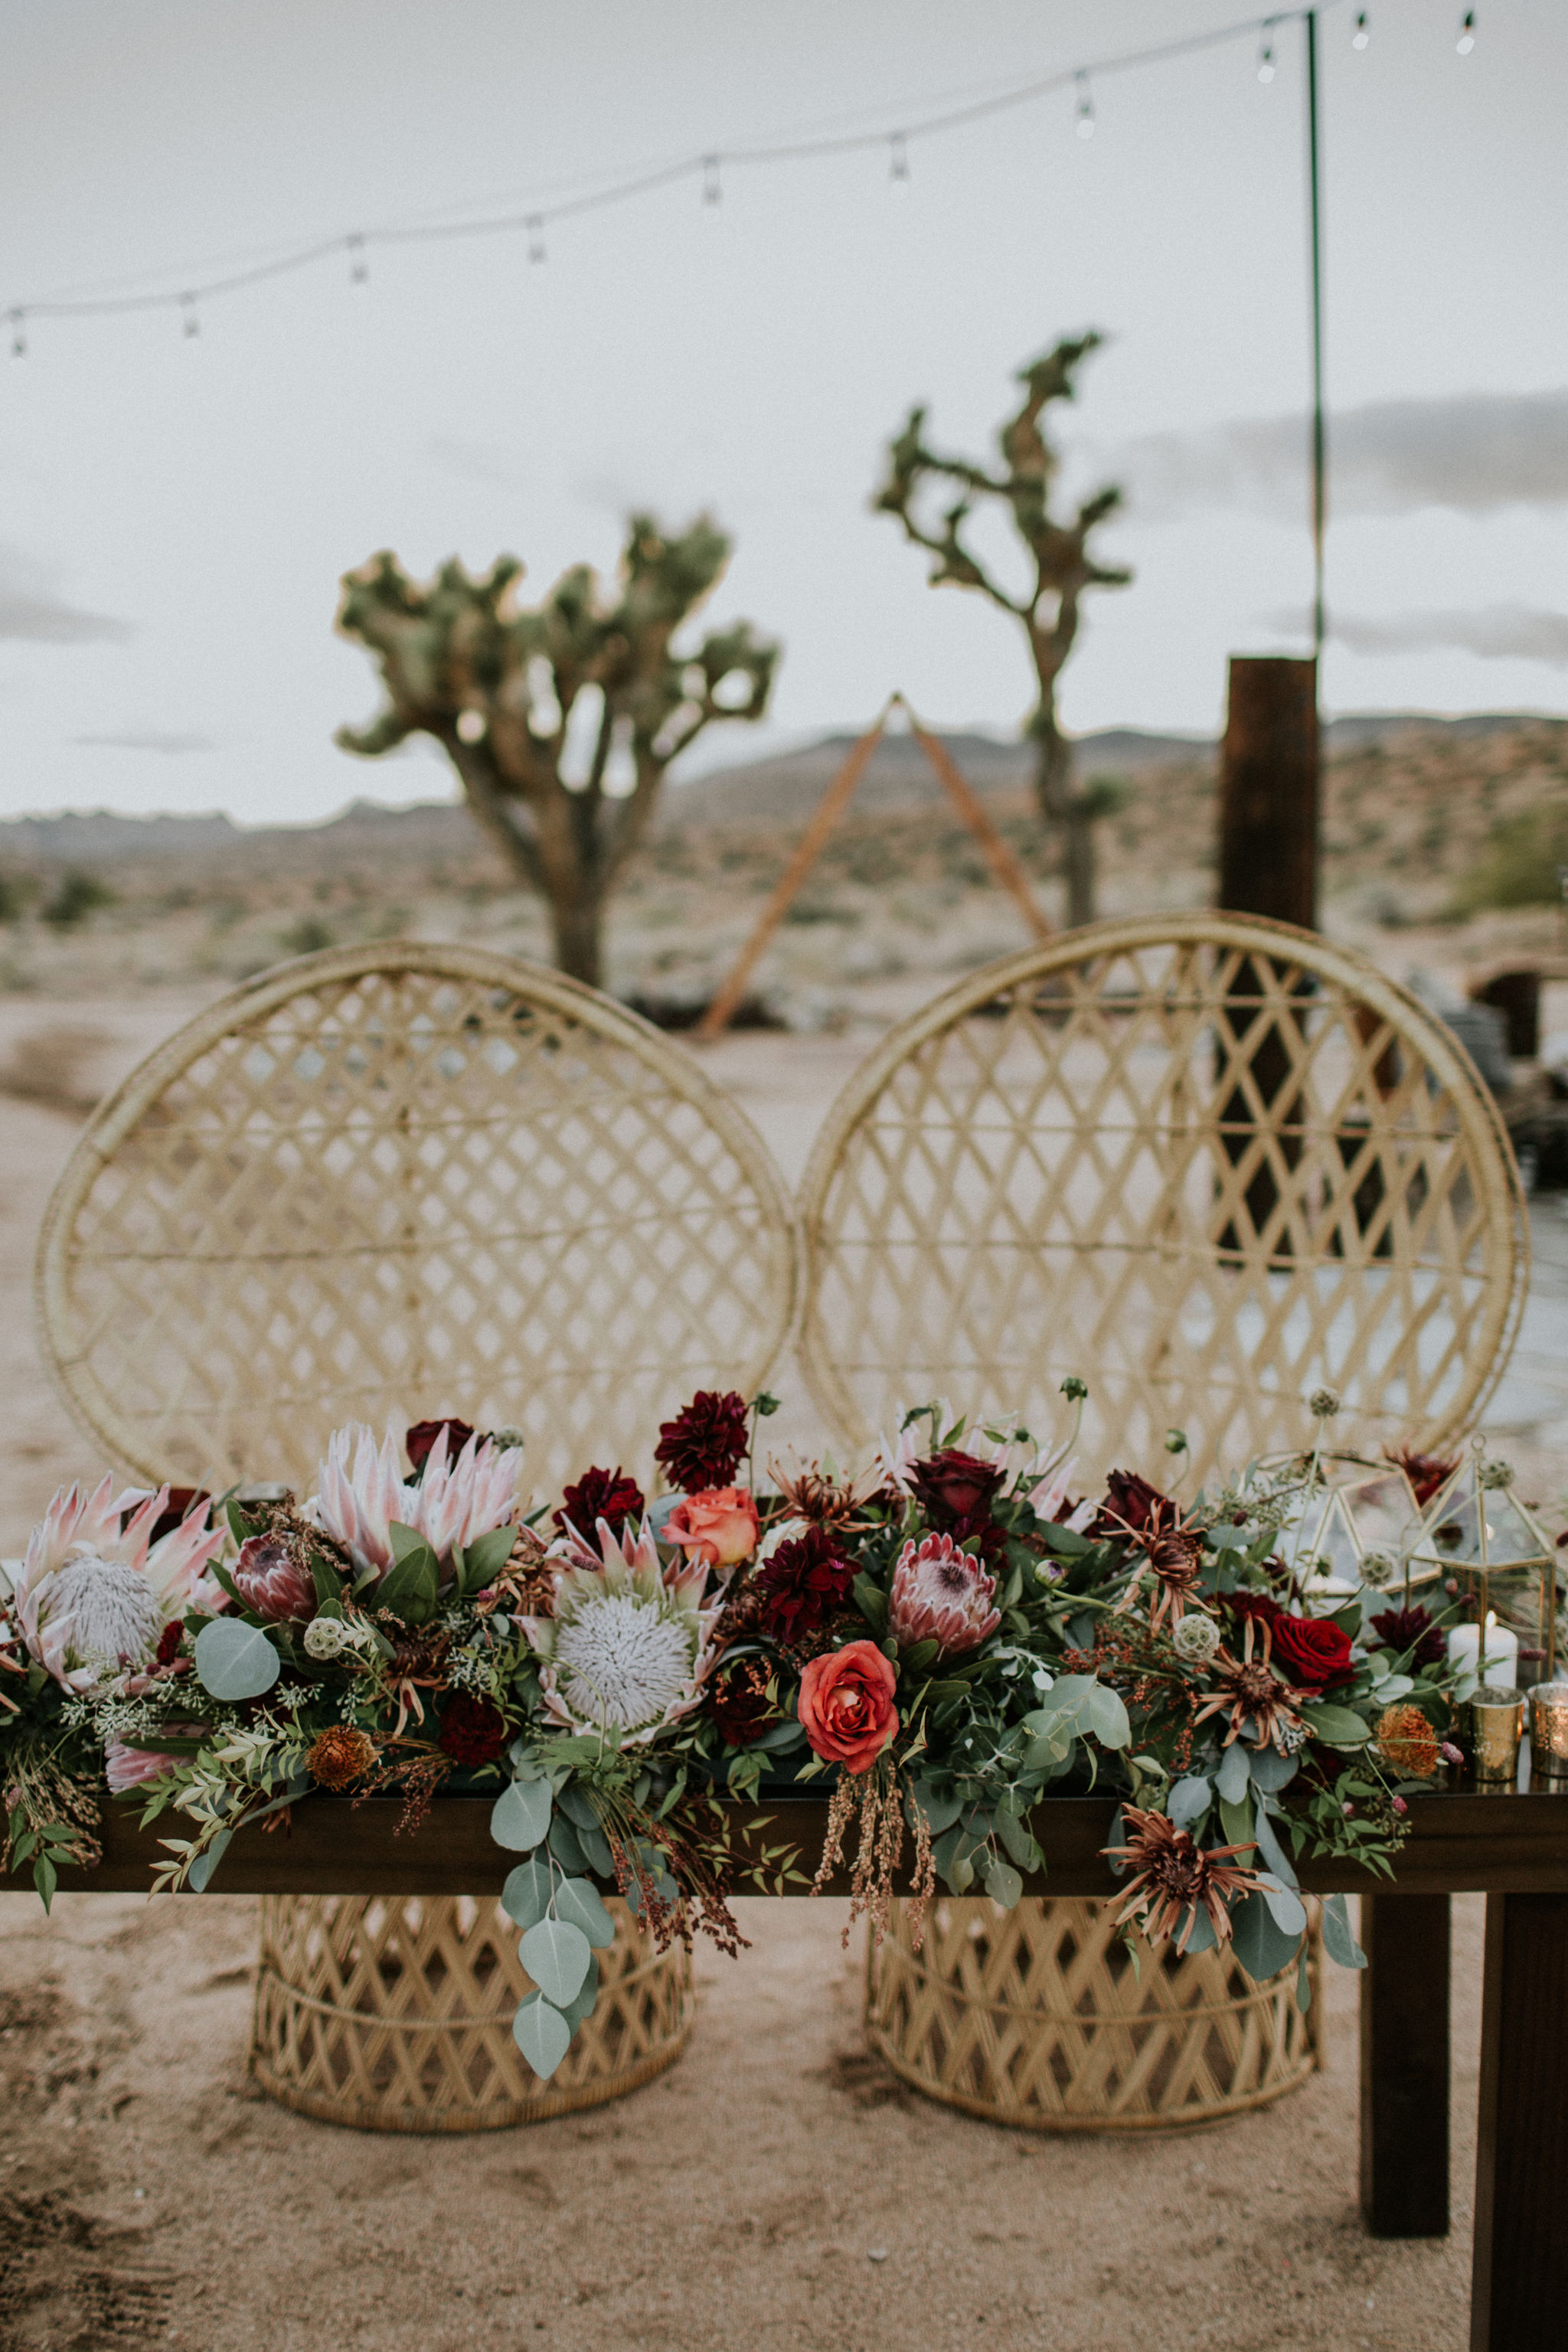 RimrockRanch-JoshuaTree-Wedding-Jami-Laree-738.jpg